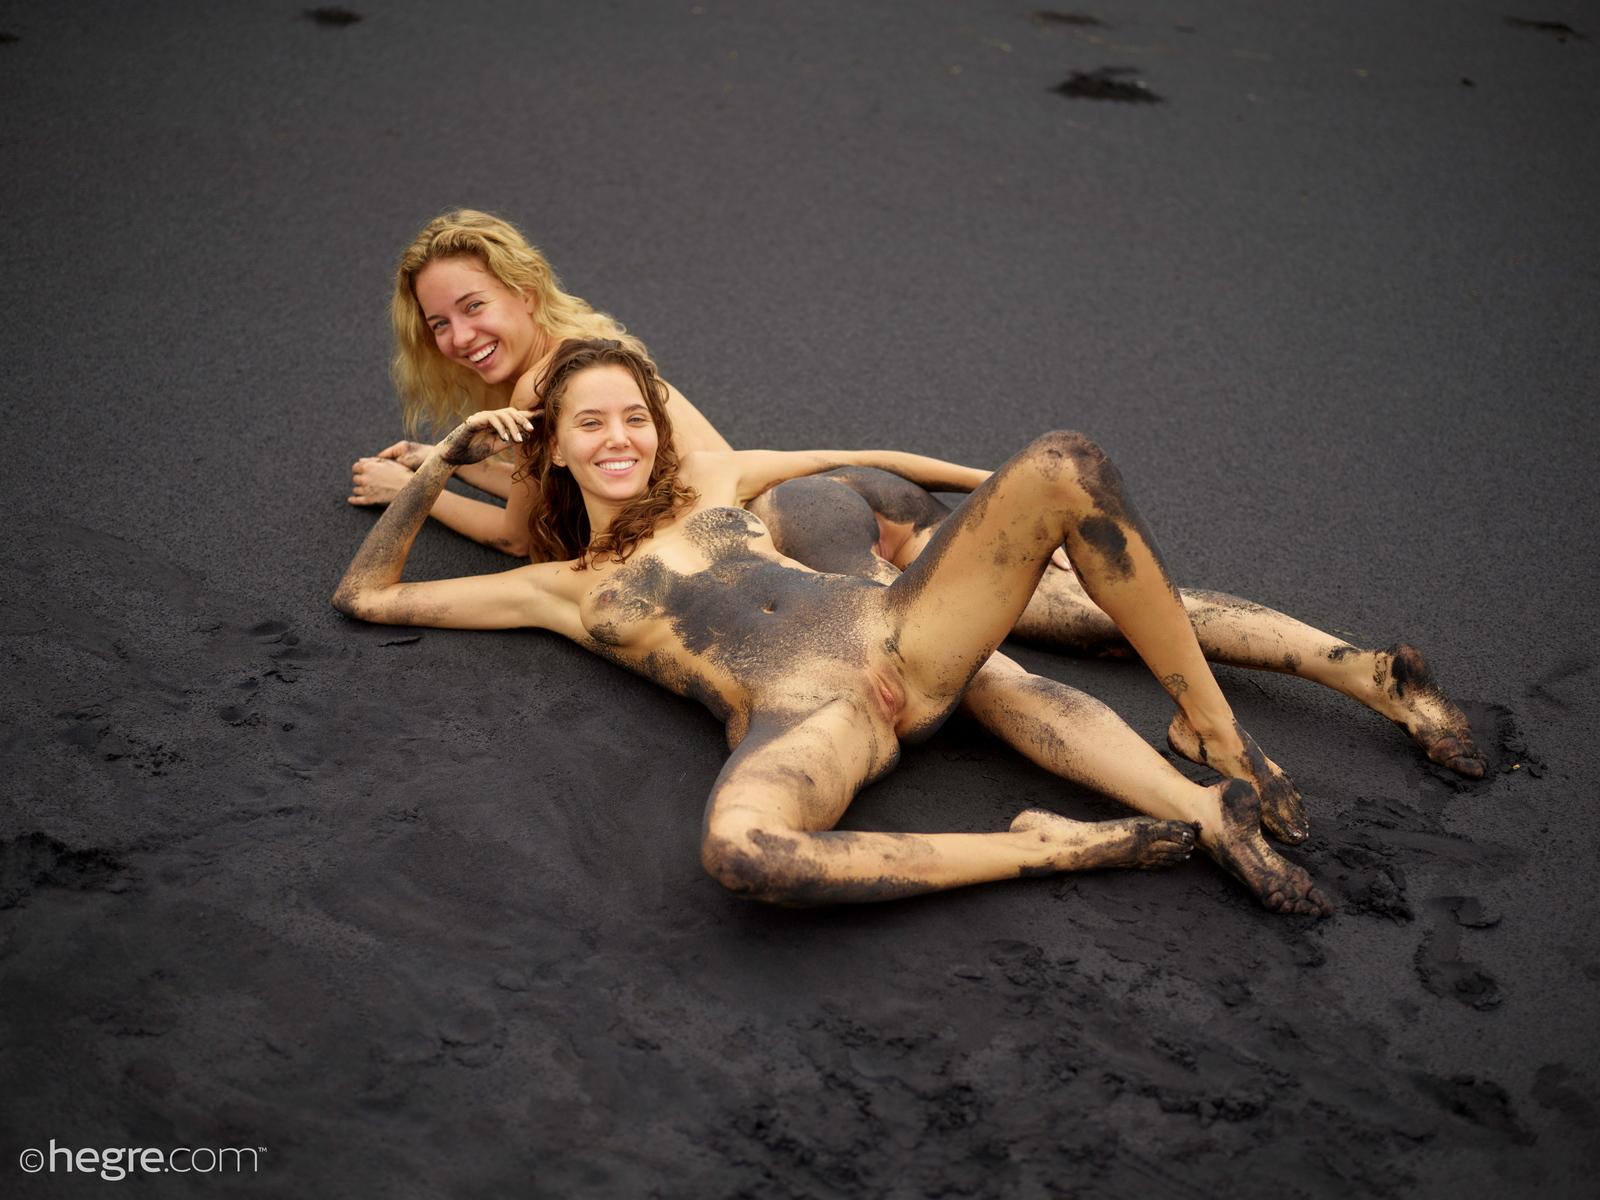 clover-natalia-a-nude-bali-beach-seaside-hegre-29